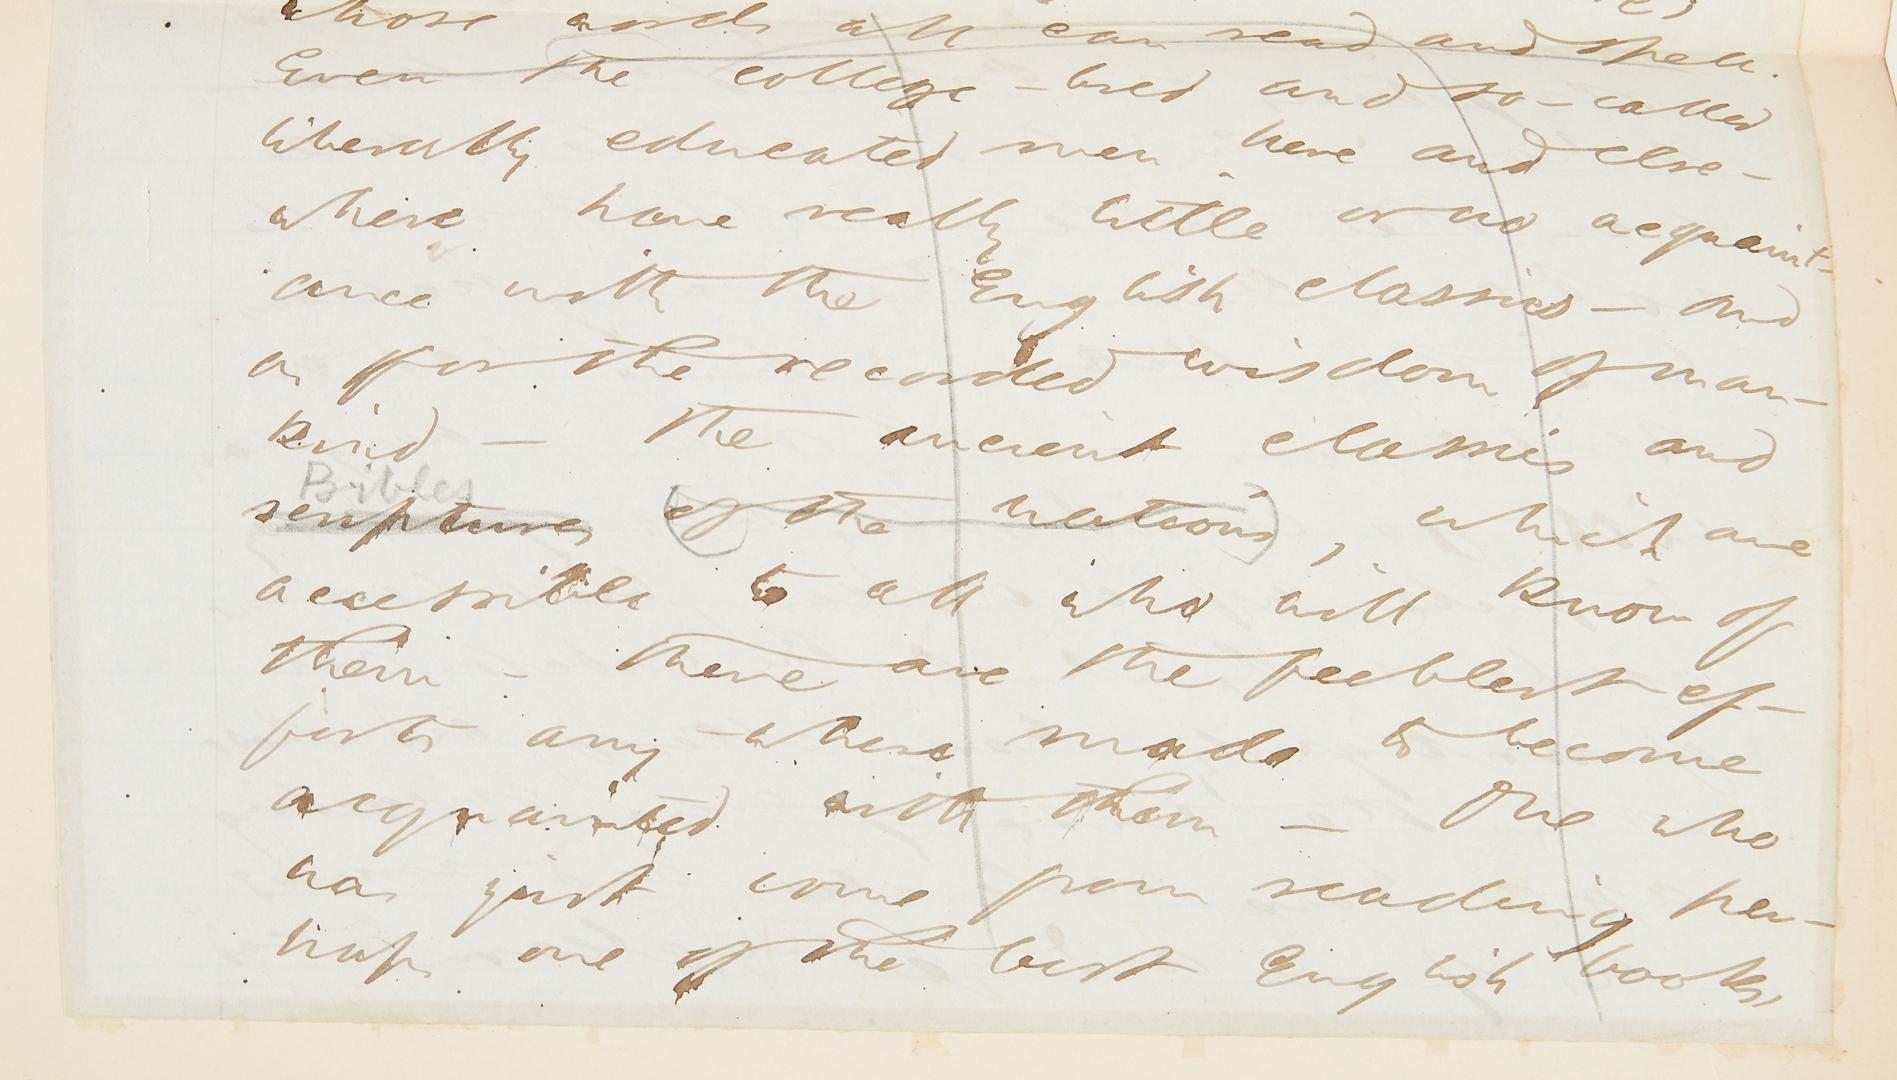 Lot 733: Writings of Thoreau, Manuscript Edition, 20 vols.